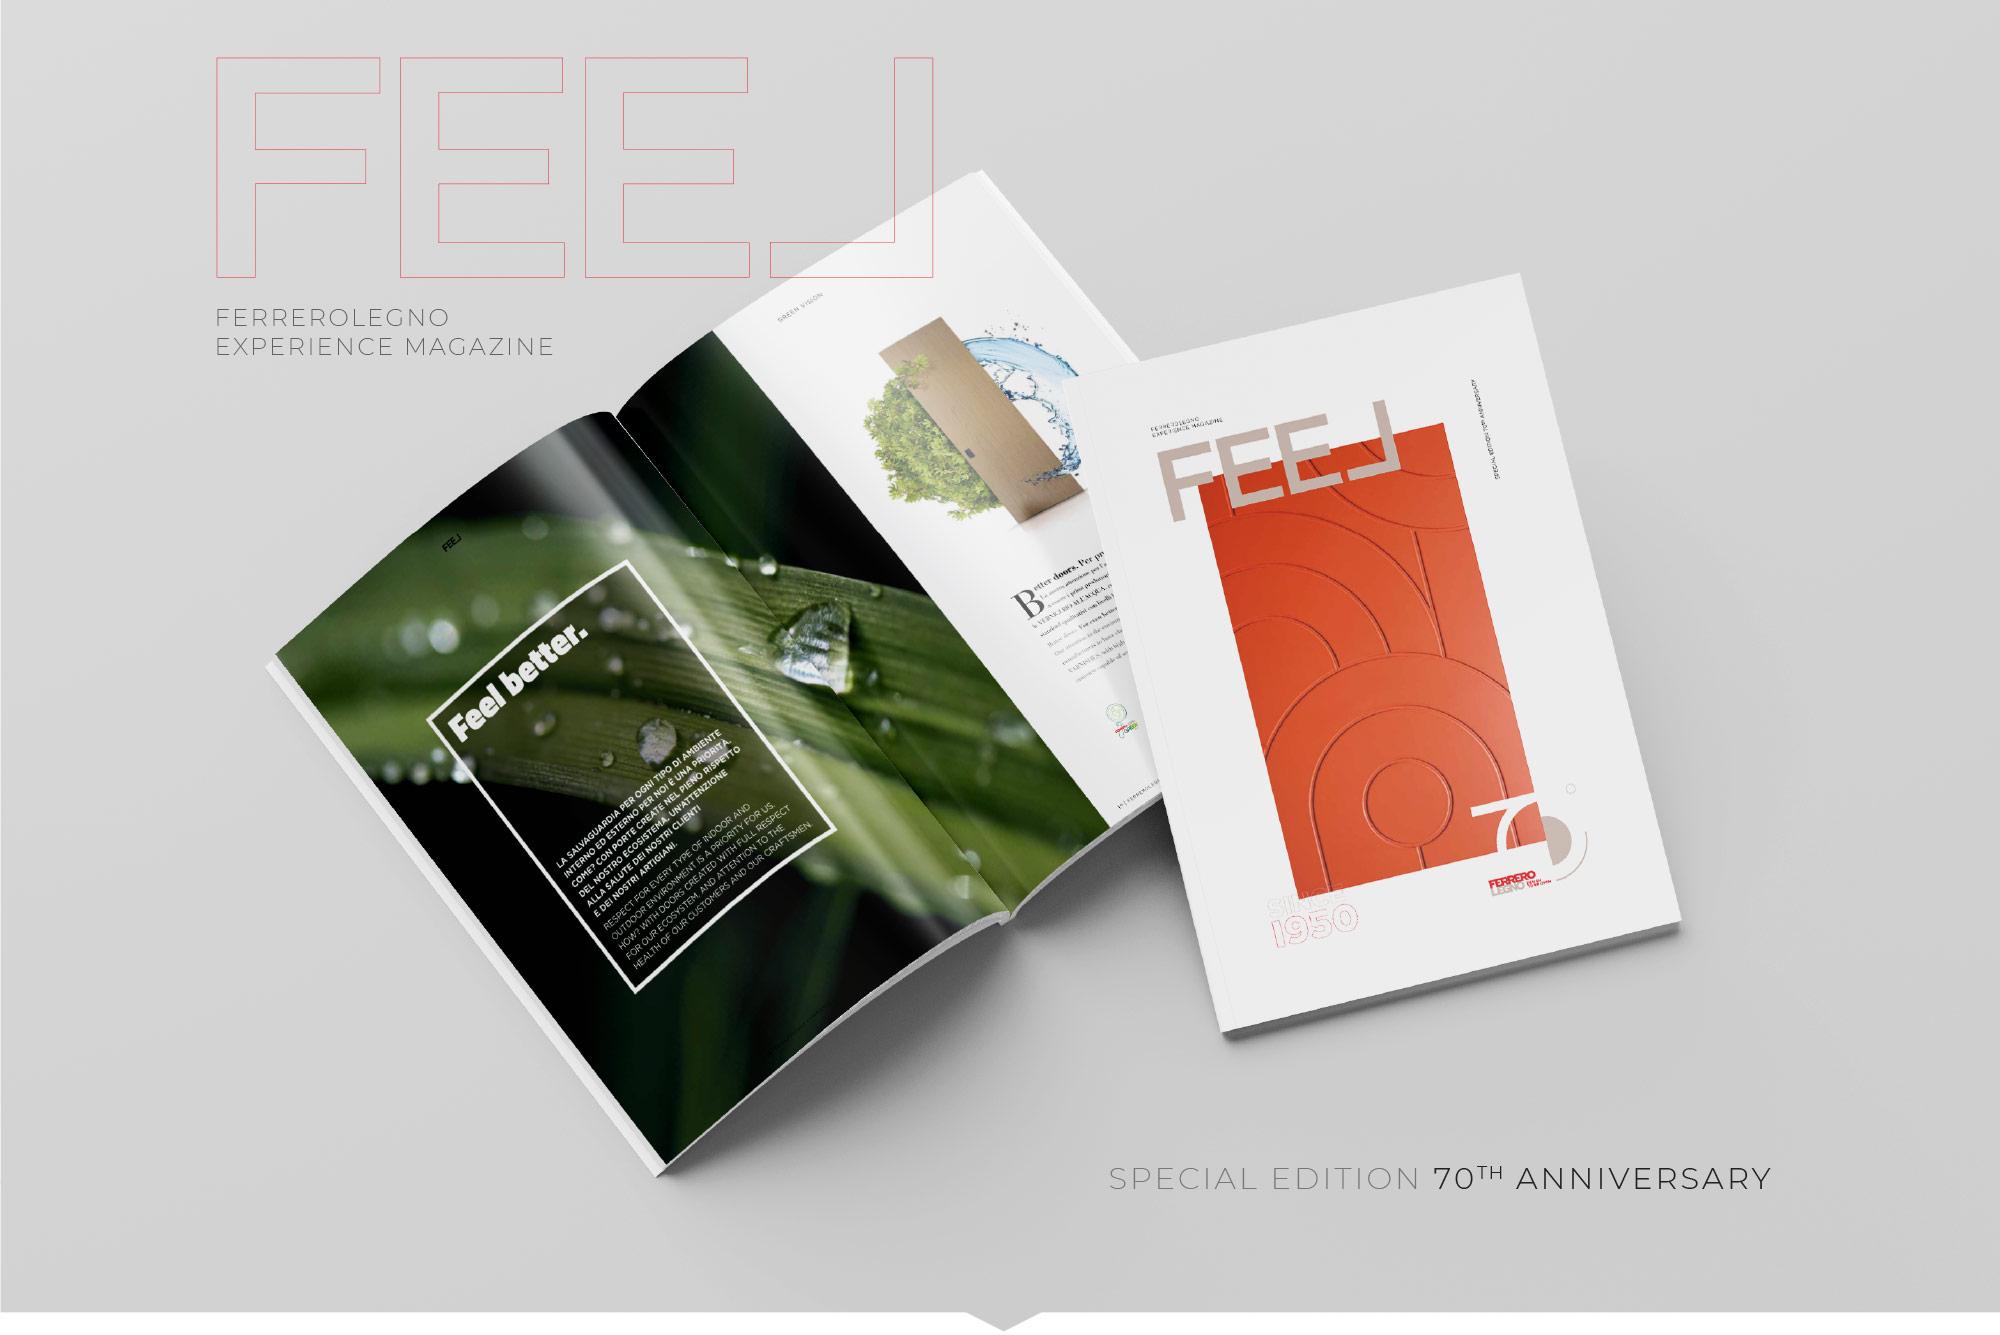 The new FerreroLegno magazine FEEL 3 has arrived!